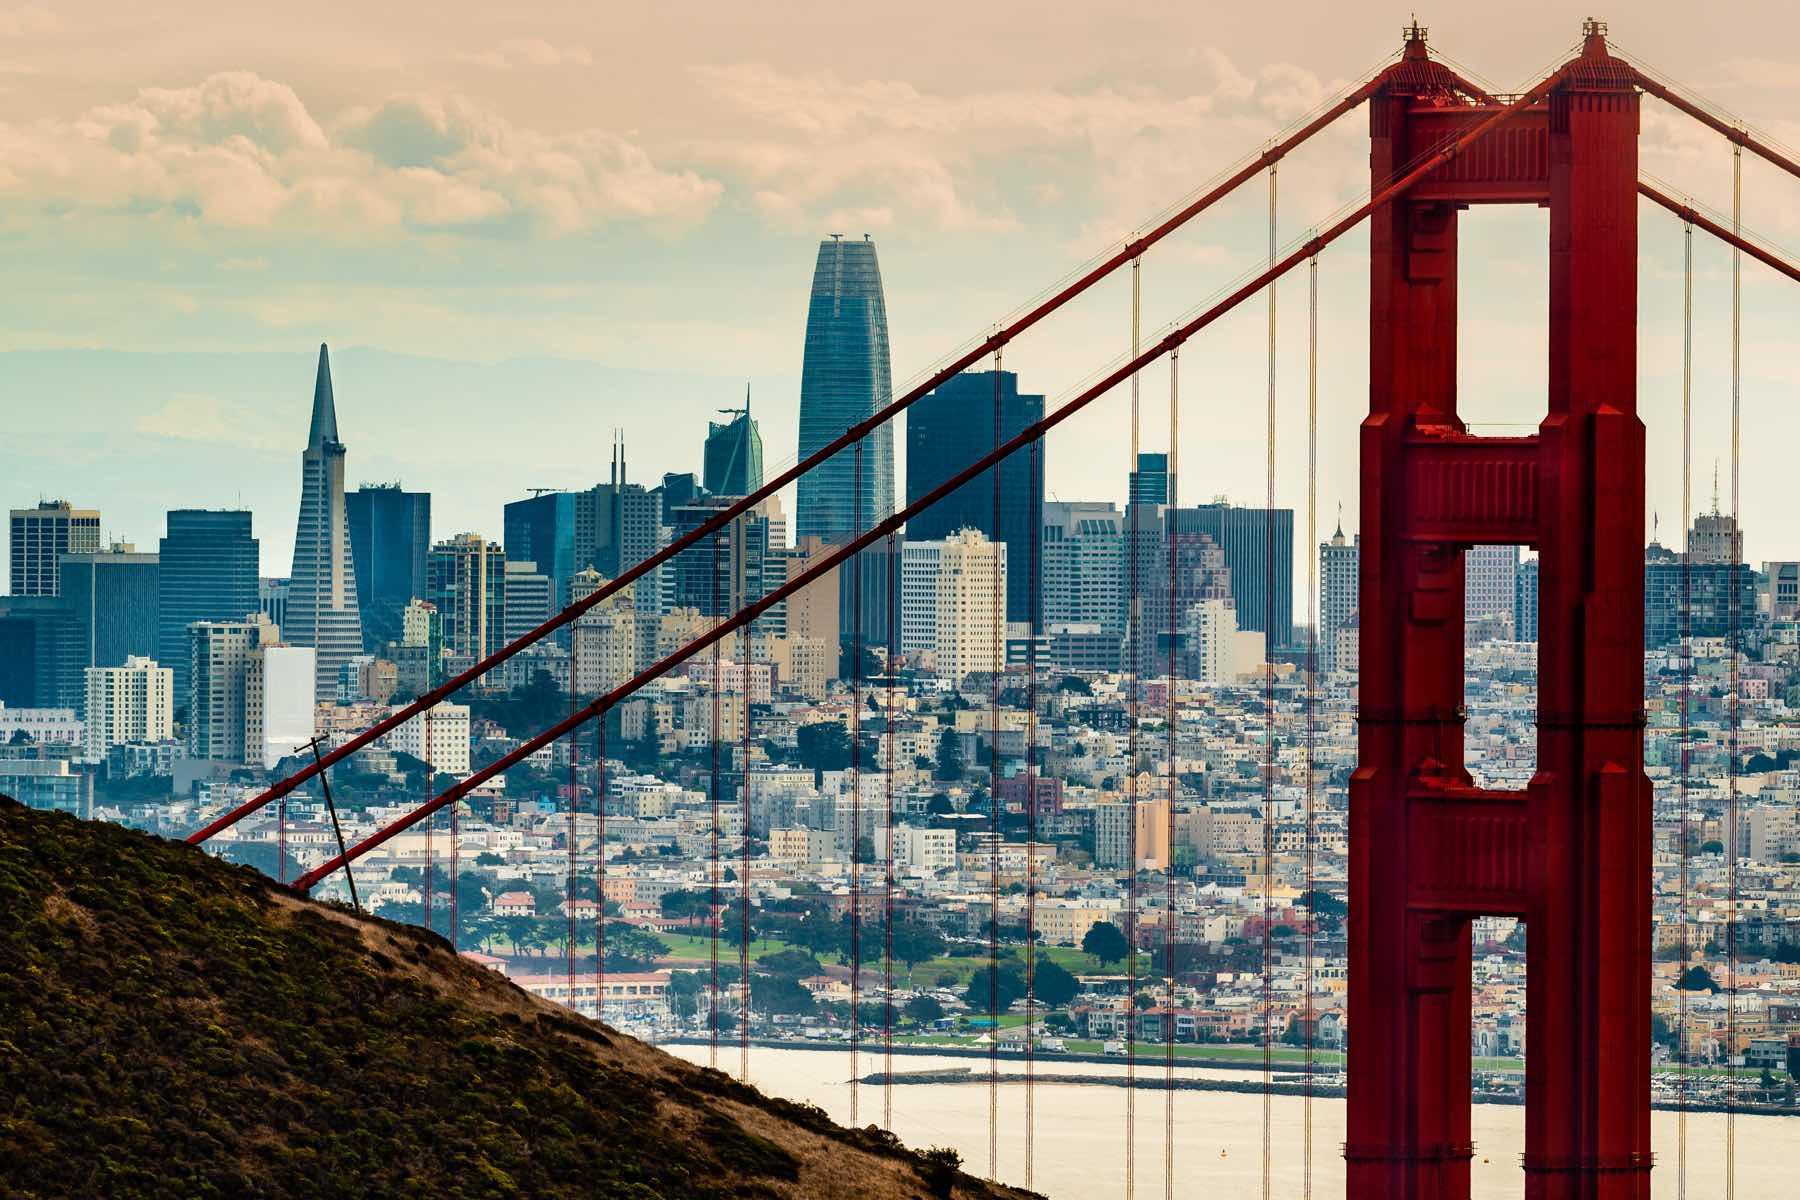 San Francisco business district